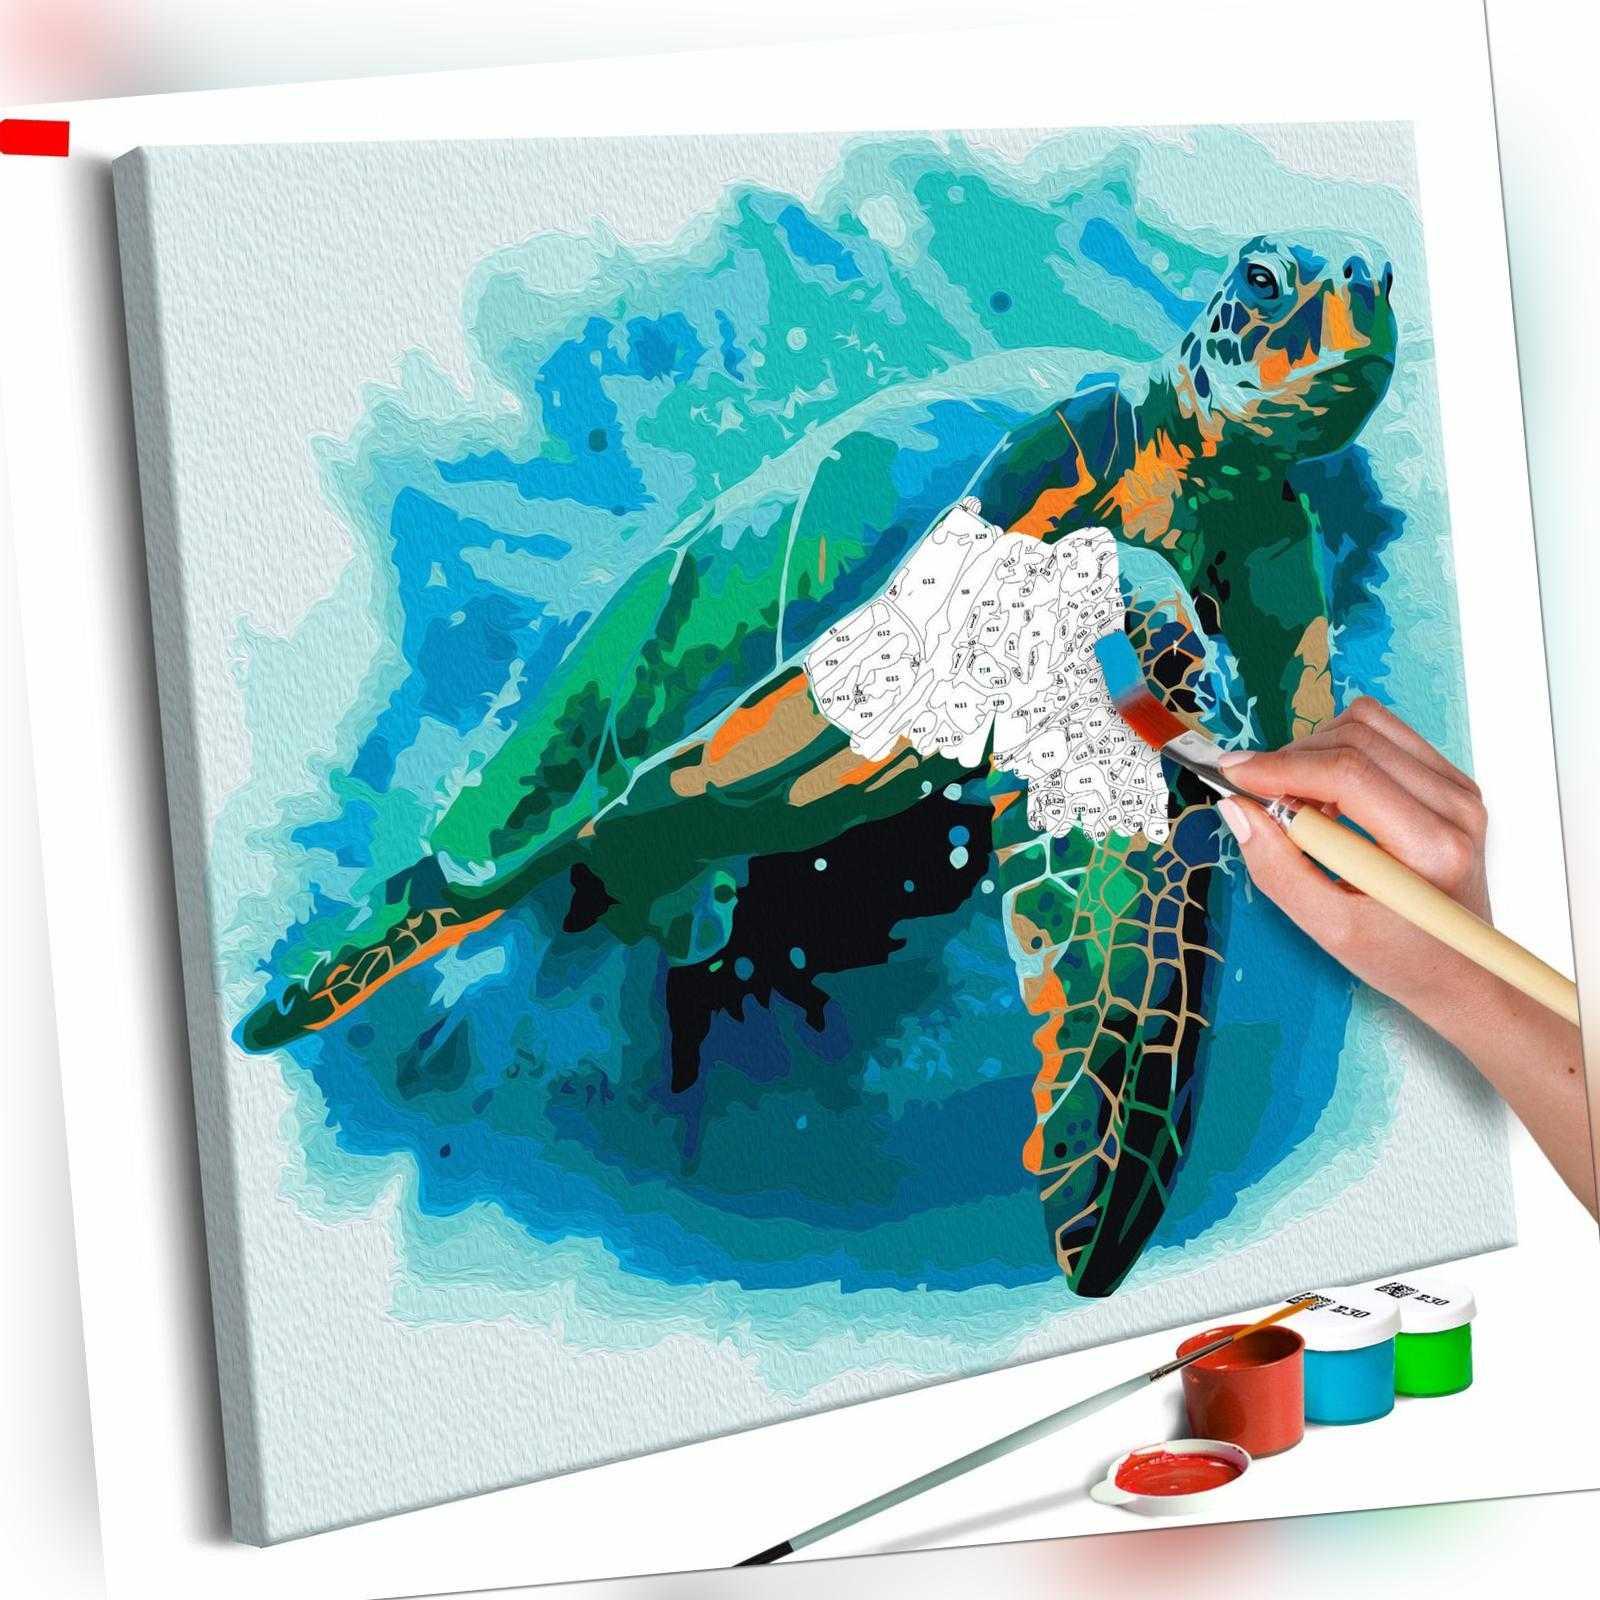 Malset mit Holzrahmen 40x40 Leinwand Erwachsene Gemälde Kit DIY n-A-0315-d-a